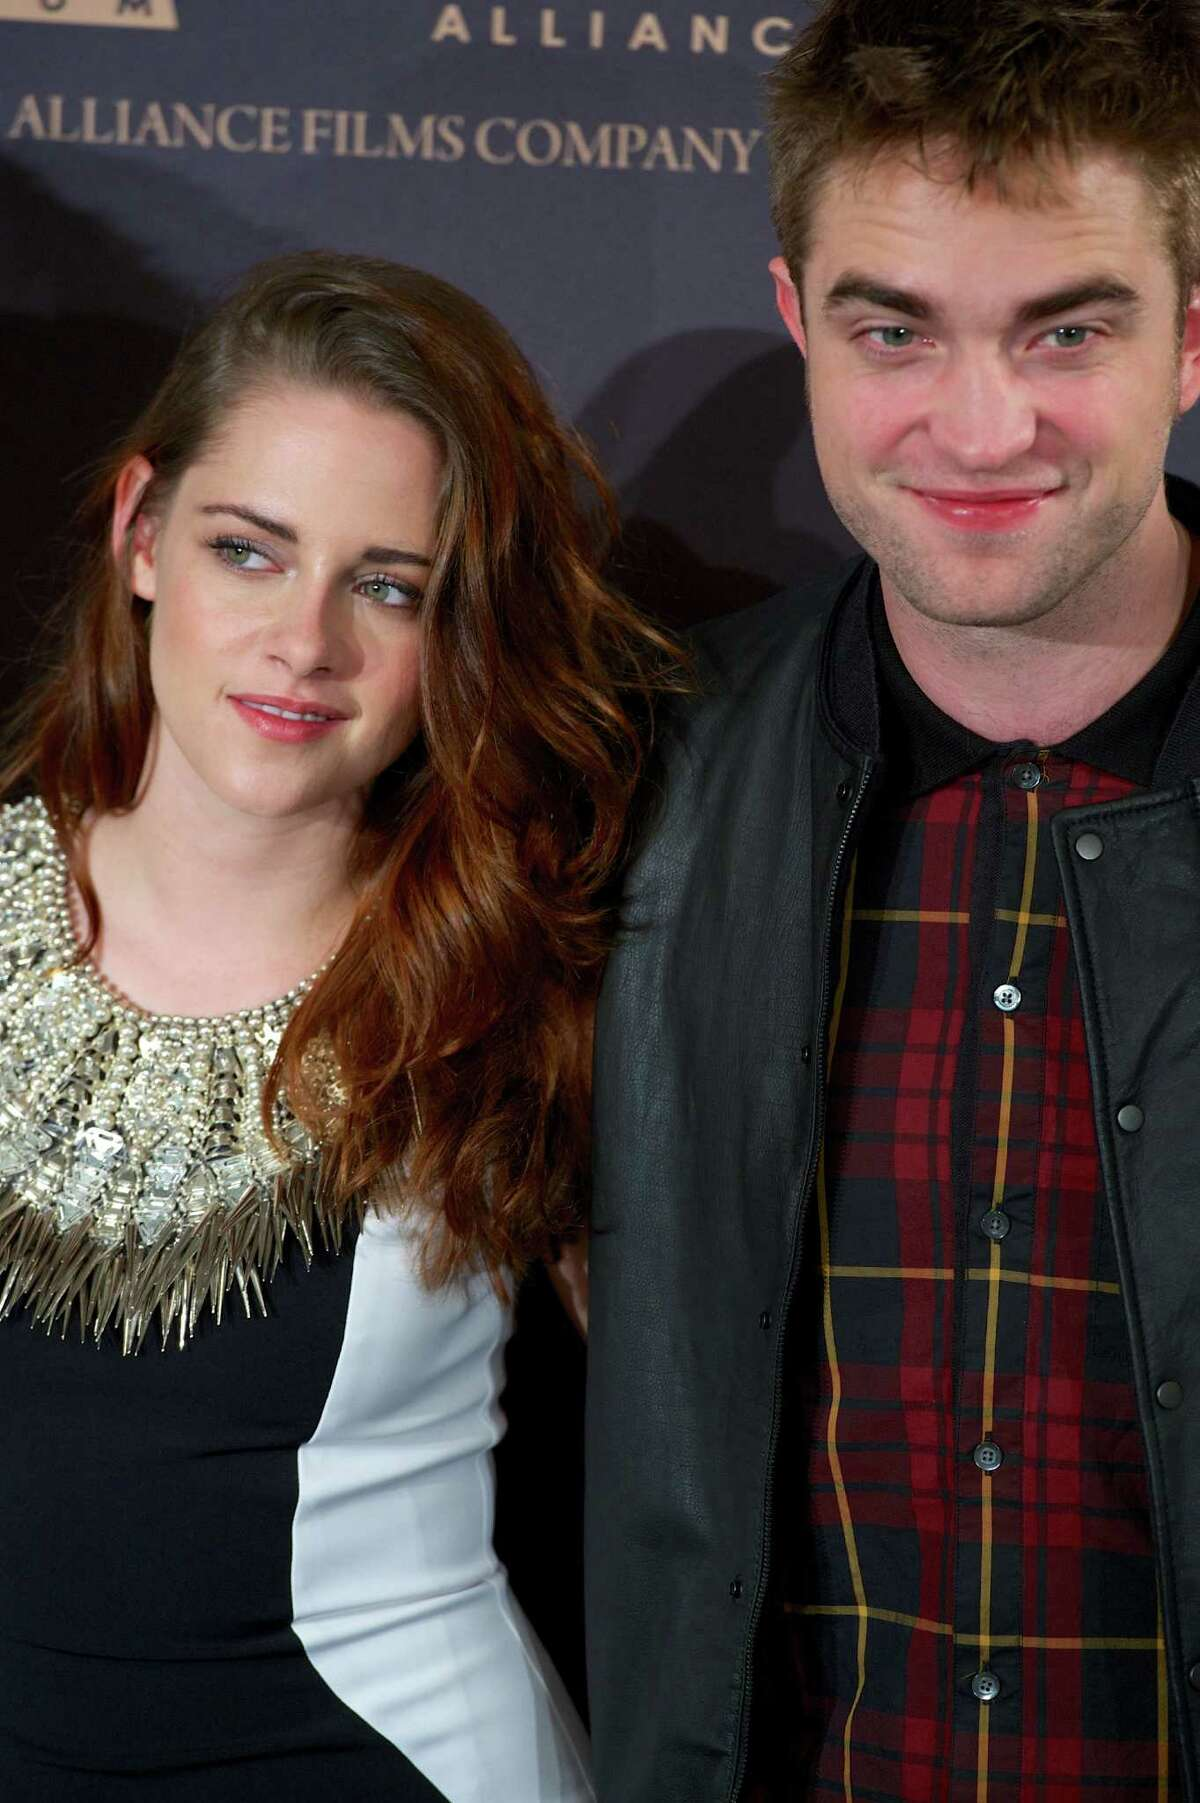 MADRID, SPAIN - NOVEMBER 15: Actress Kristen Stewart and actor Robert Pattinson attend the